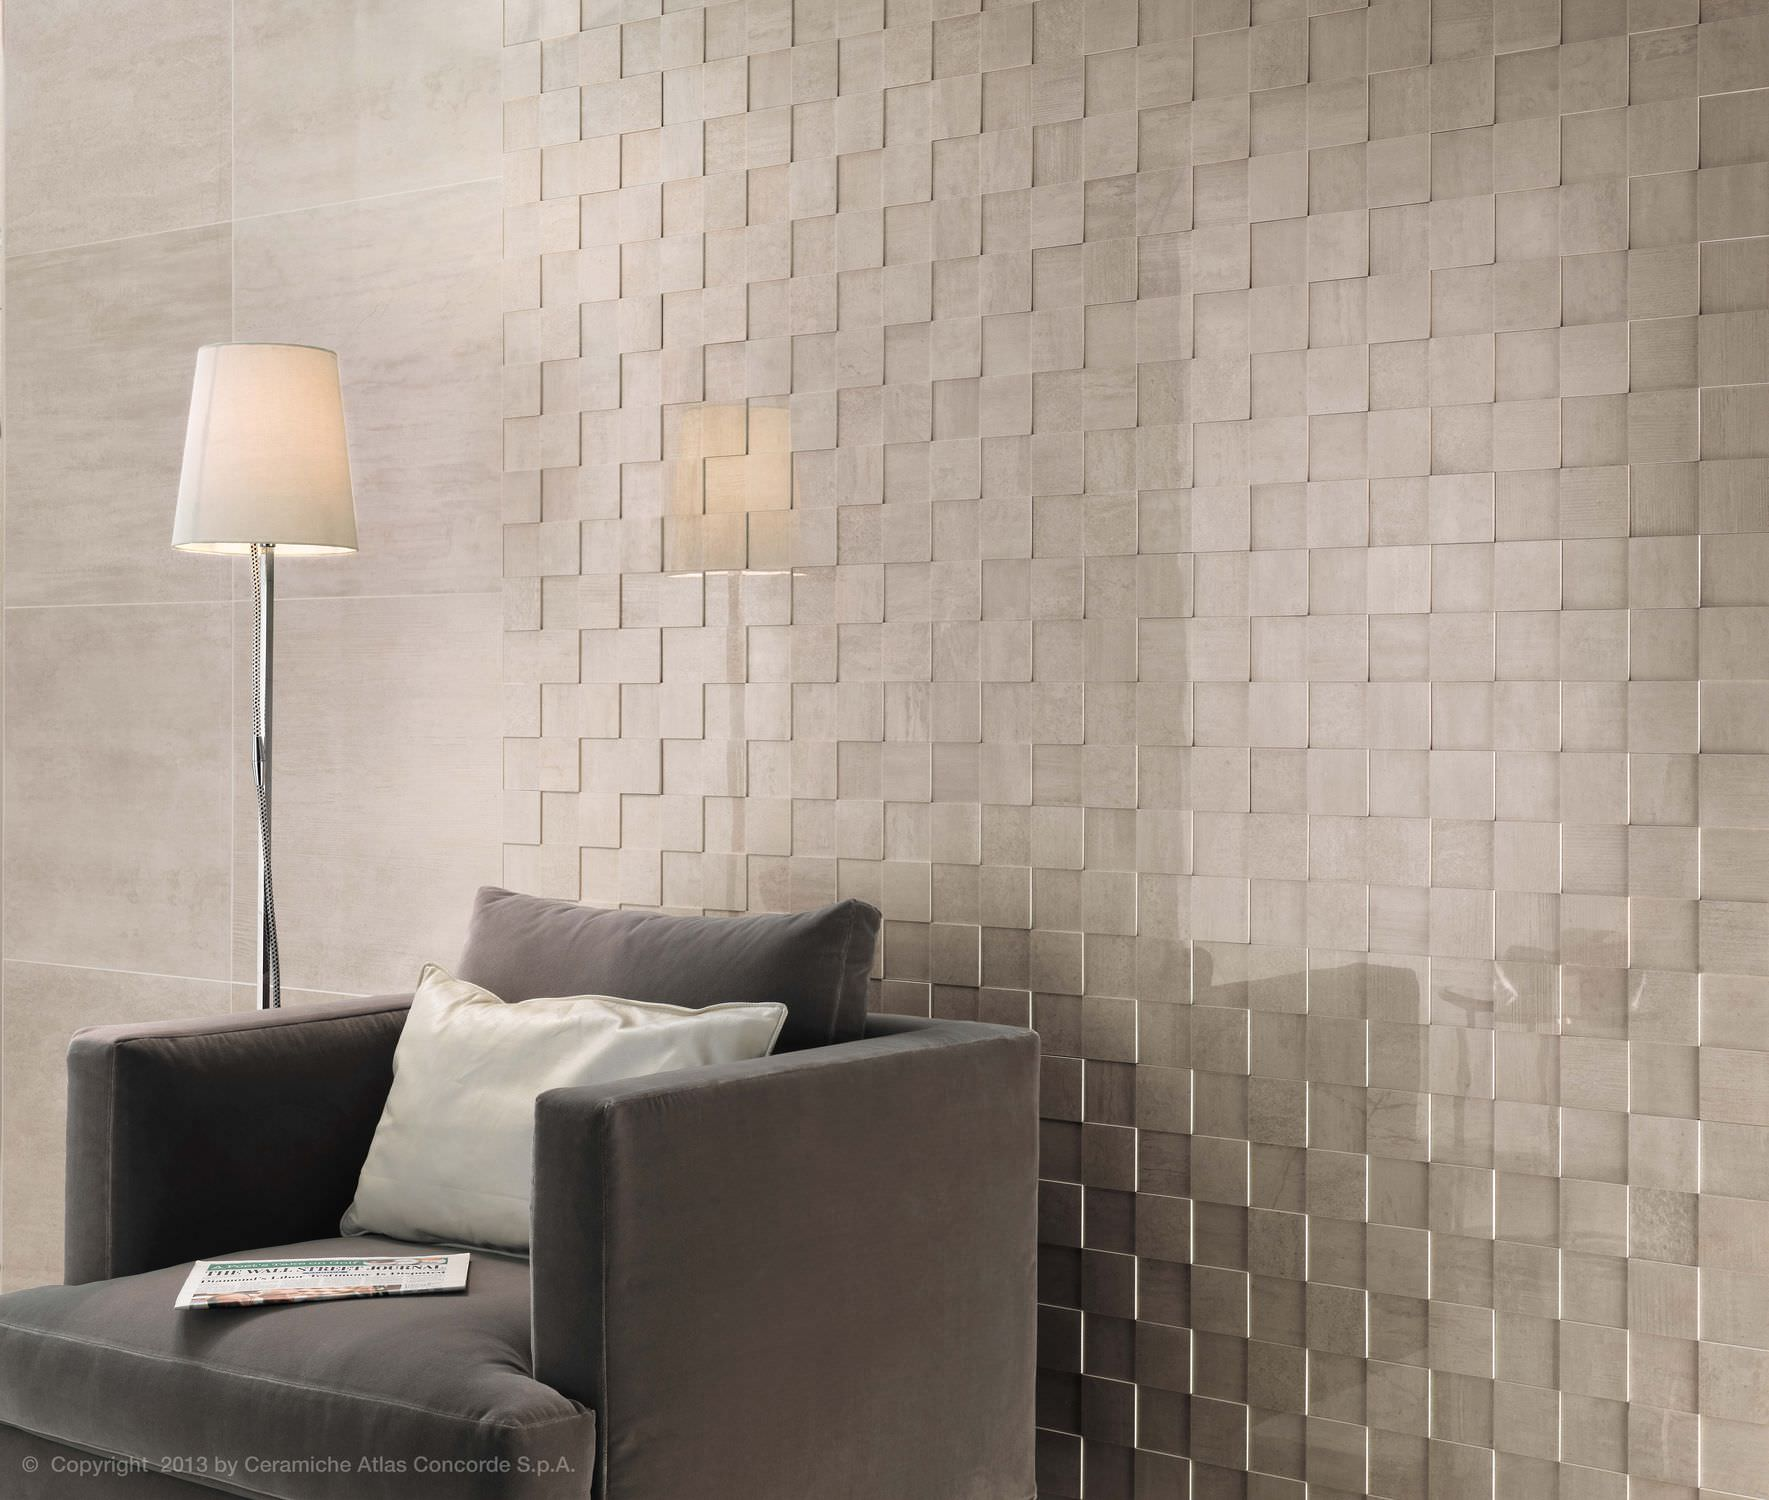 Atlas concorde vangeli giuseppe arredo bagno a milano via donatello 11 interior design - Carrelage atlas concorde ...